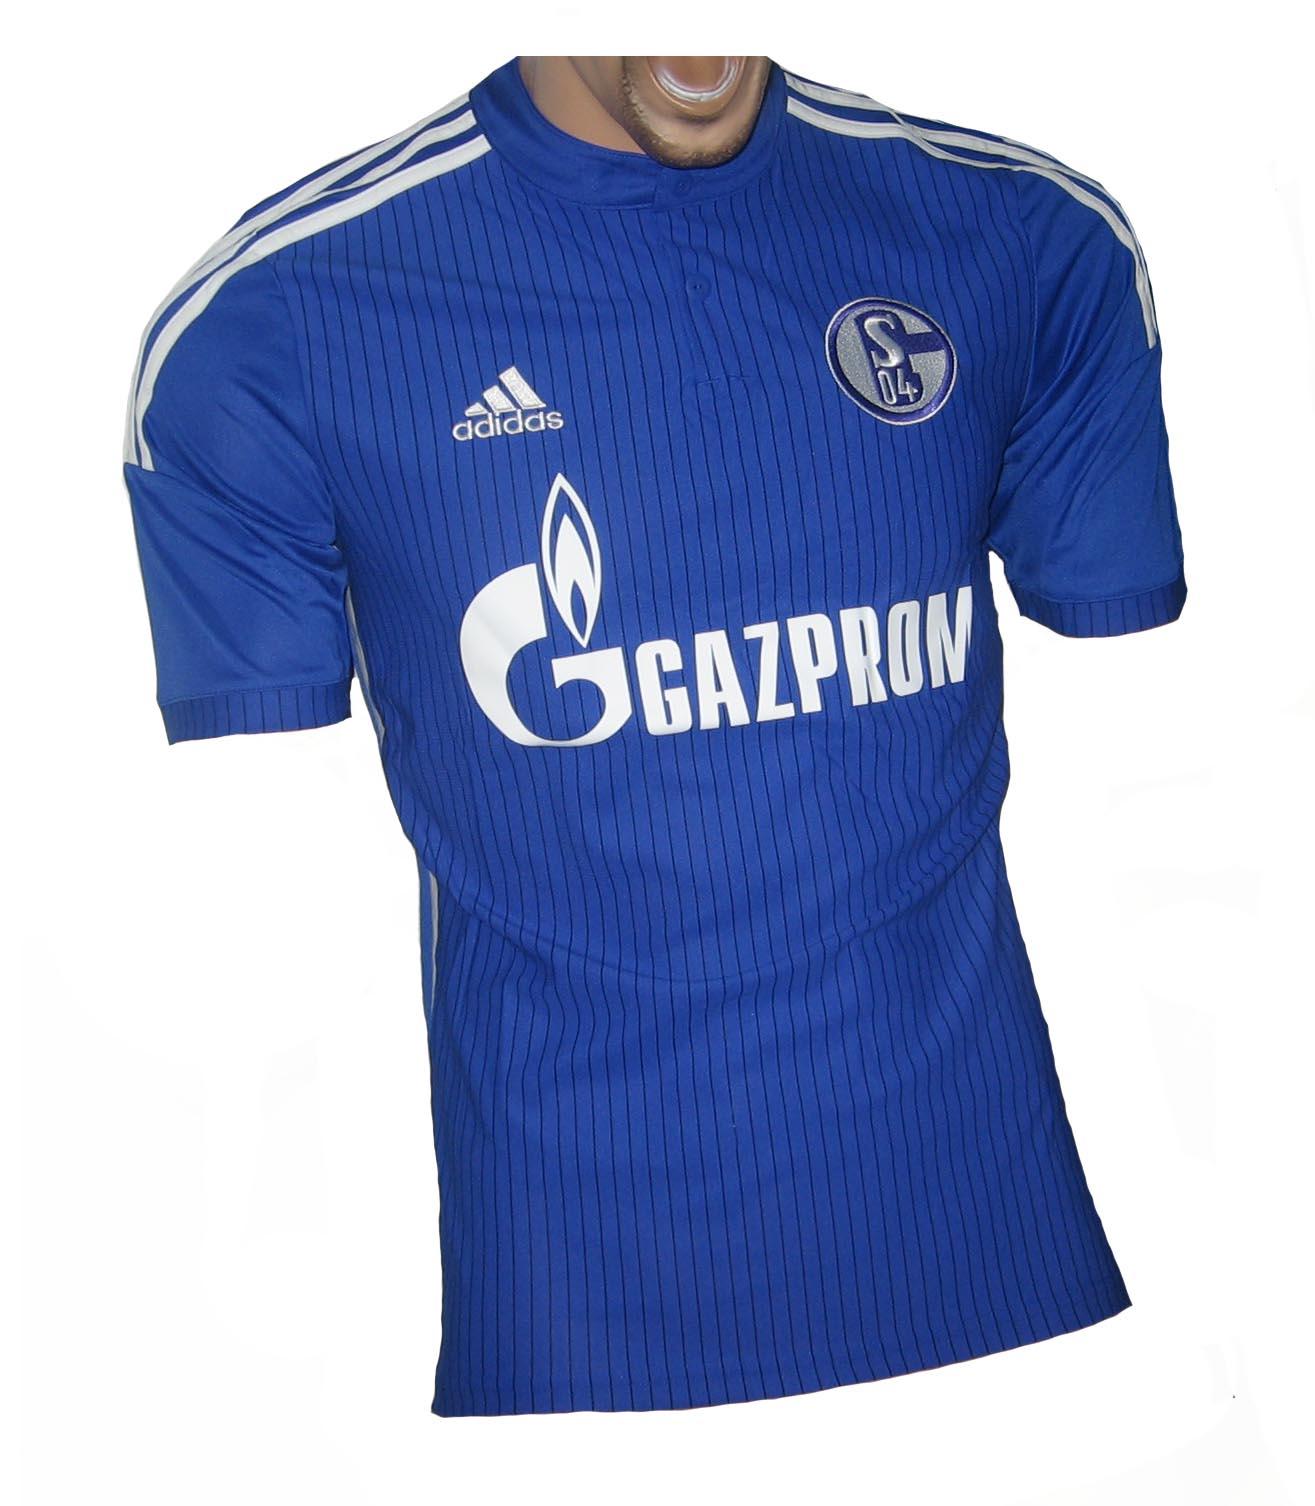 Fc Schalke 04 Trikot Home 201516 Adidas House Of Shirts